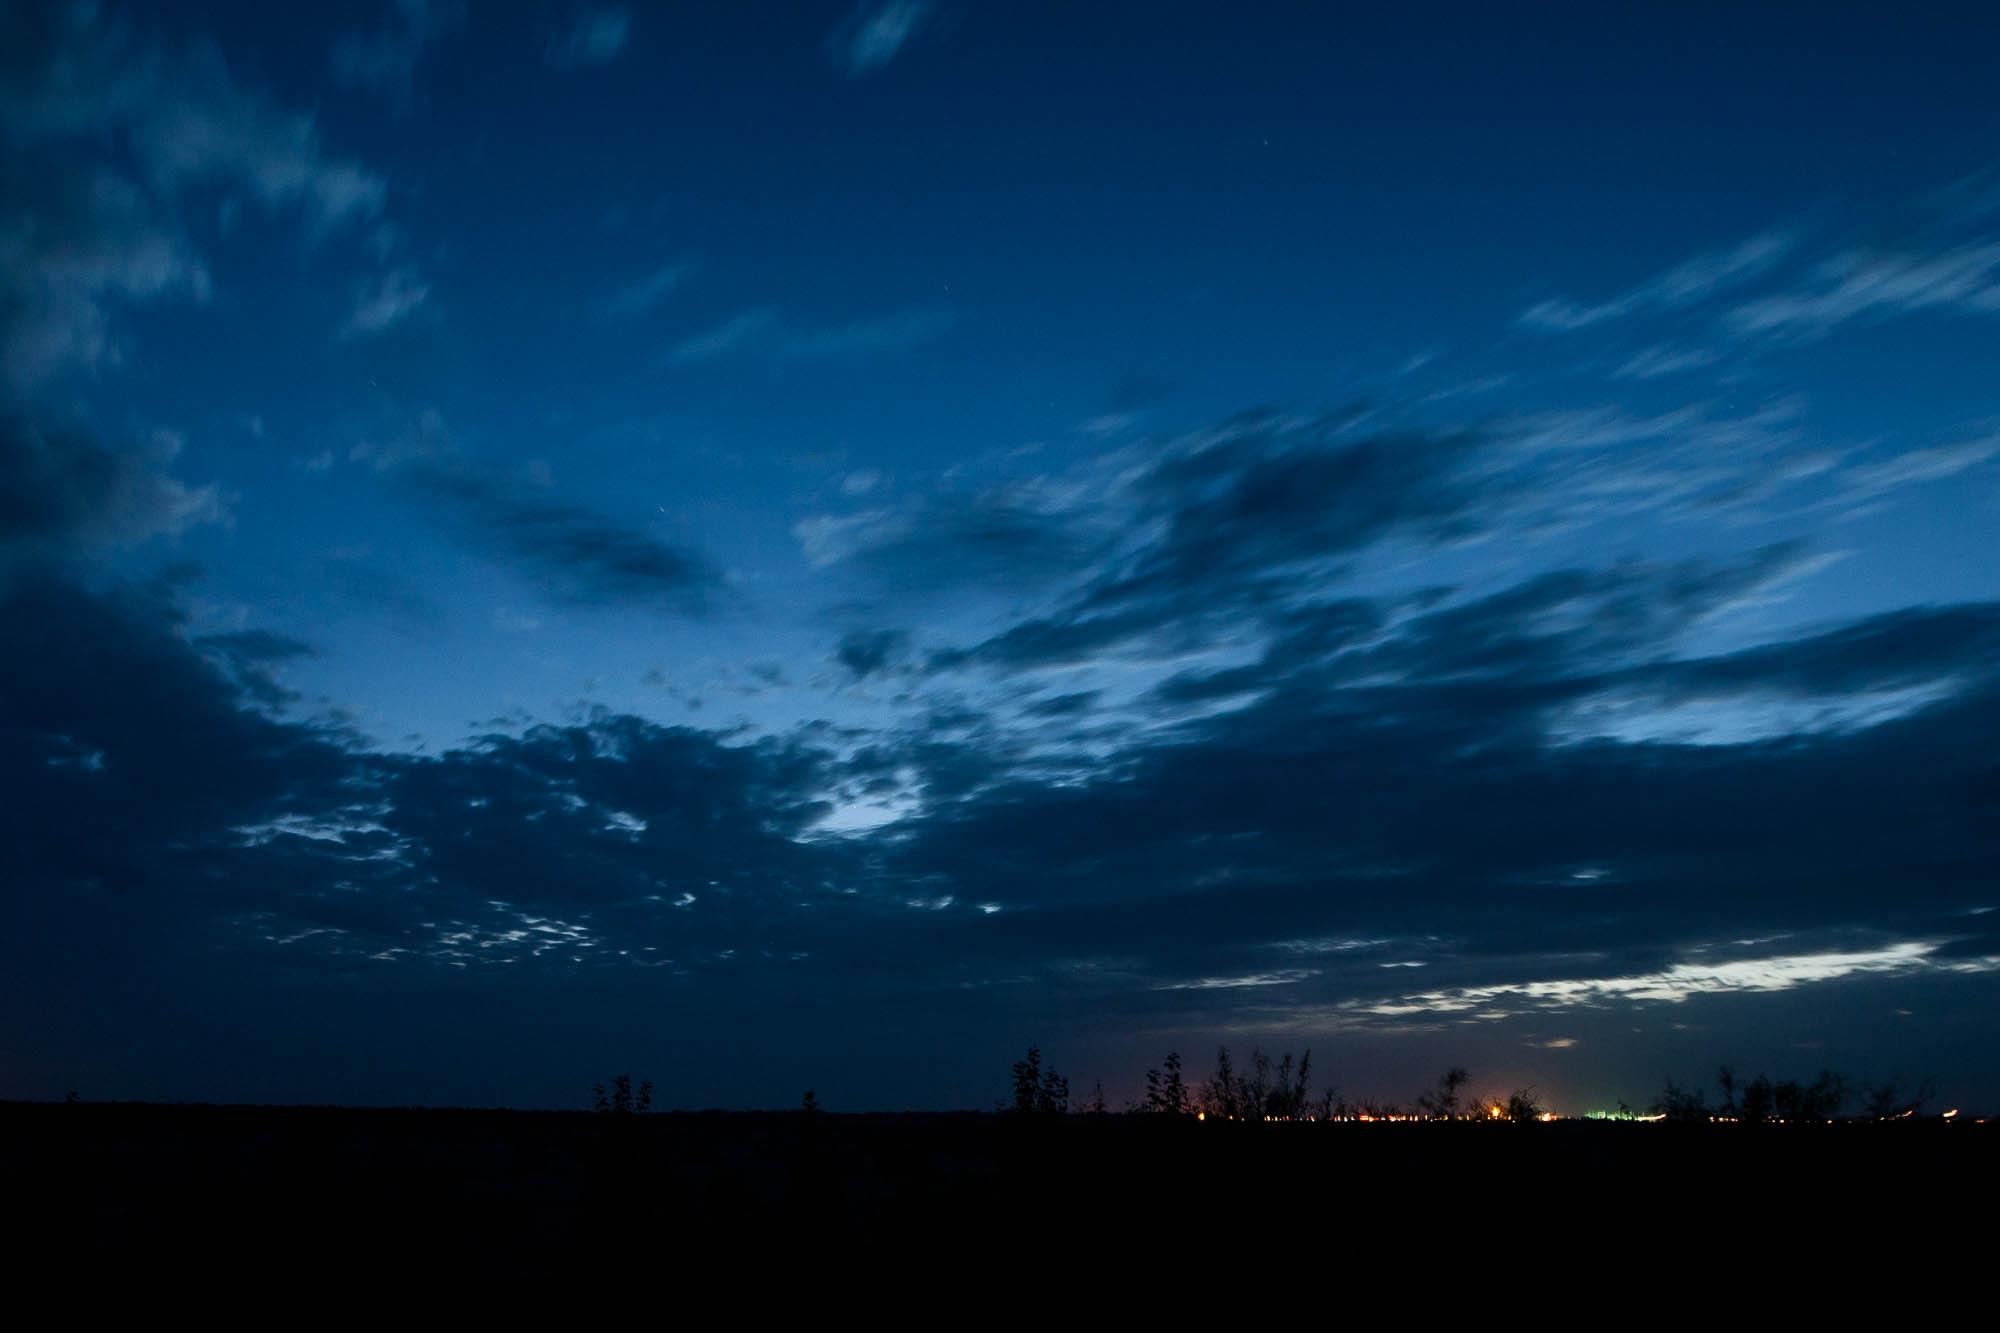 sky over Anxi